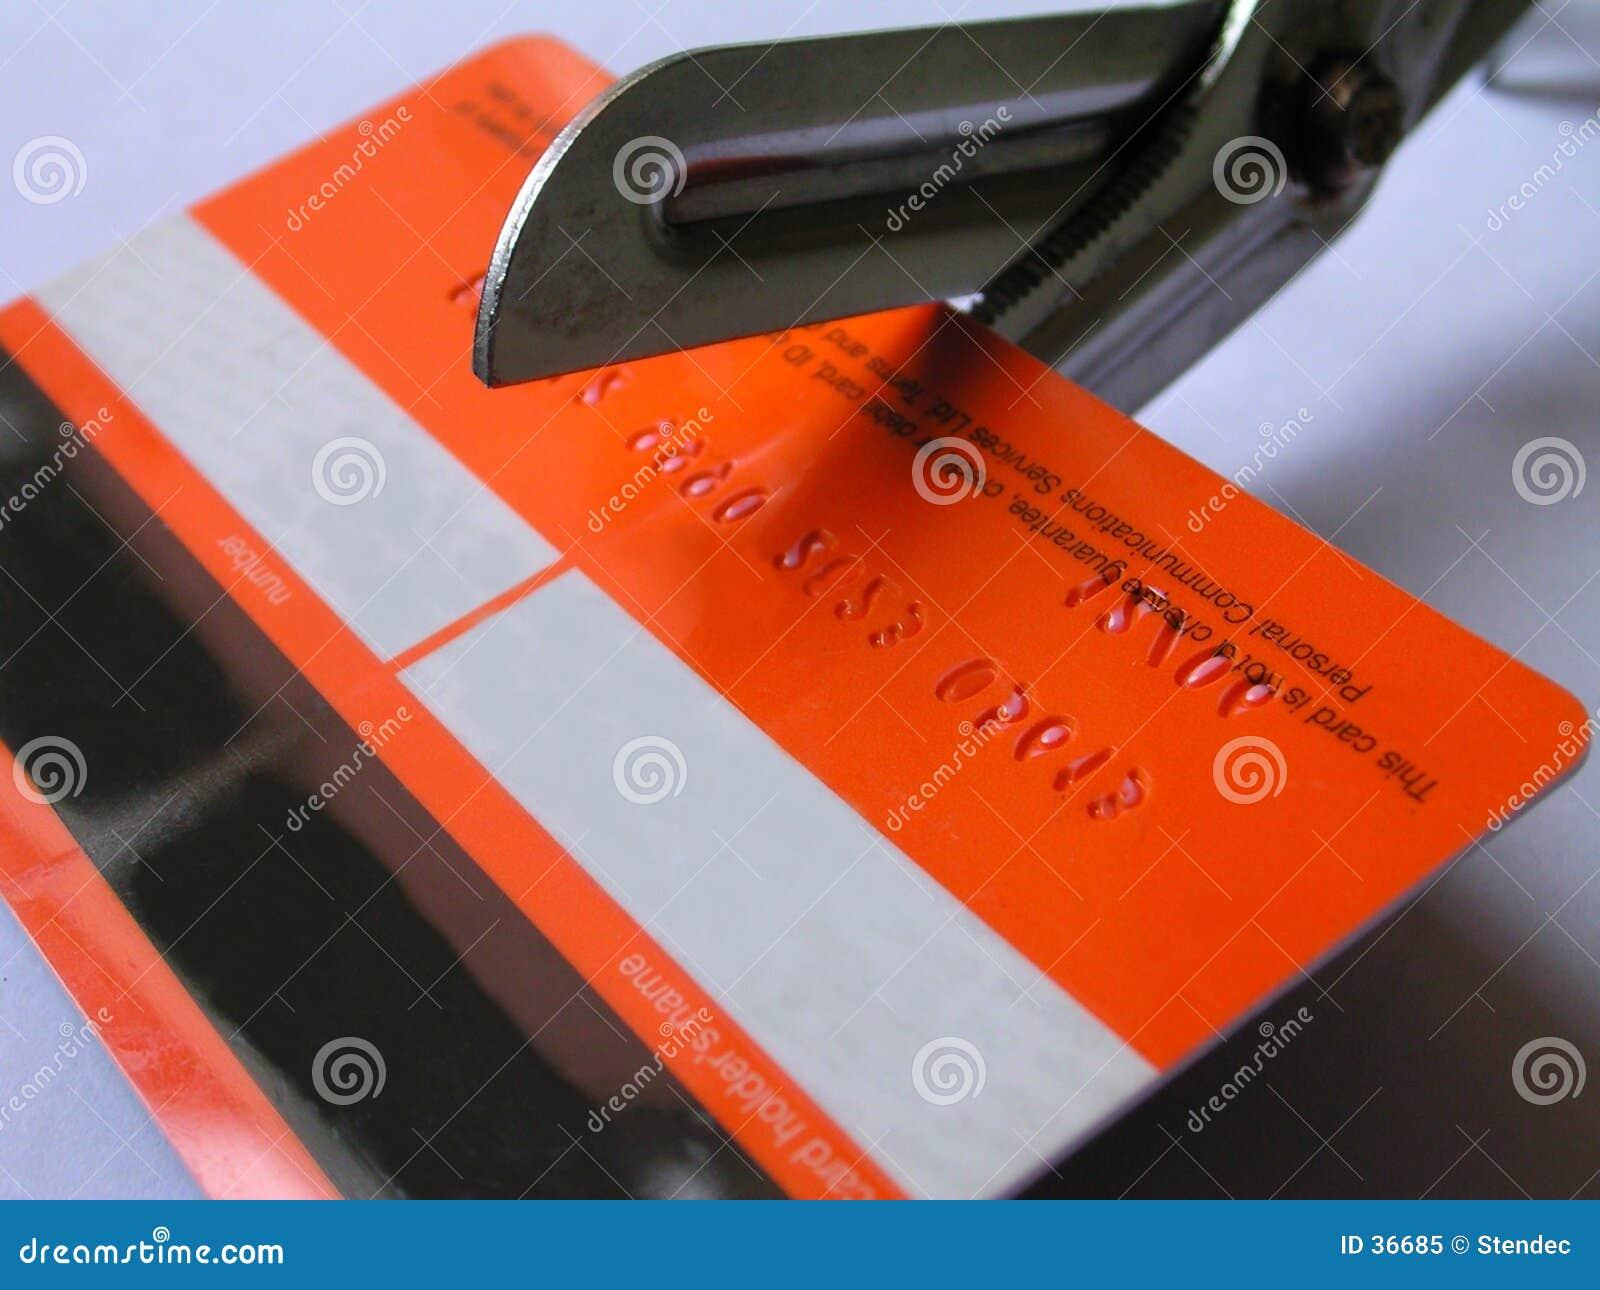 Download Tarjeta imagen de archivo. Imagen de tarjeta, crédito, éxito - 36685